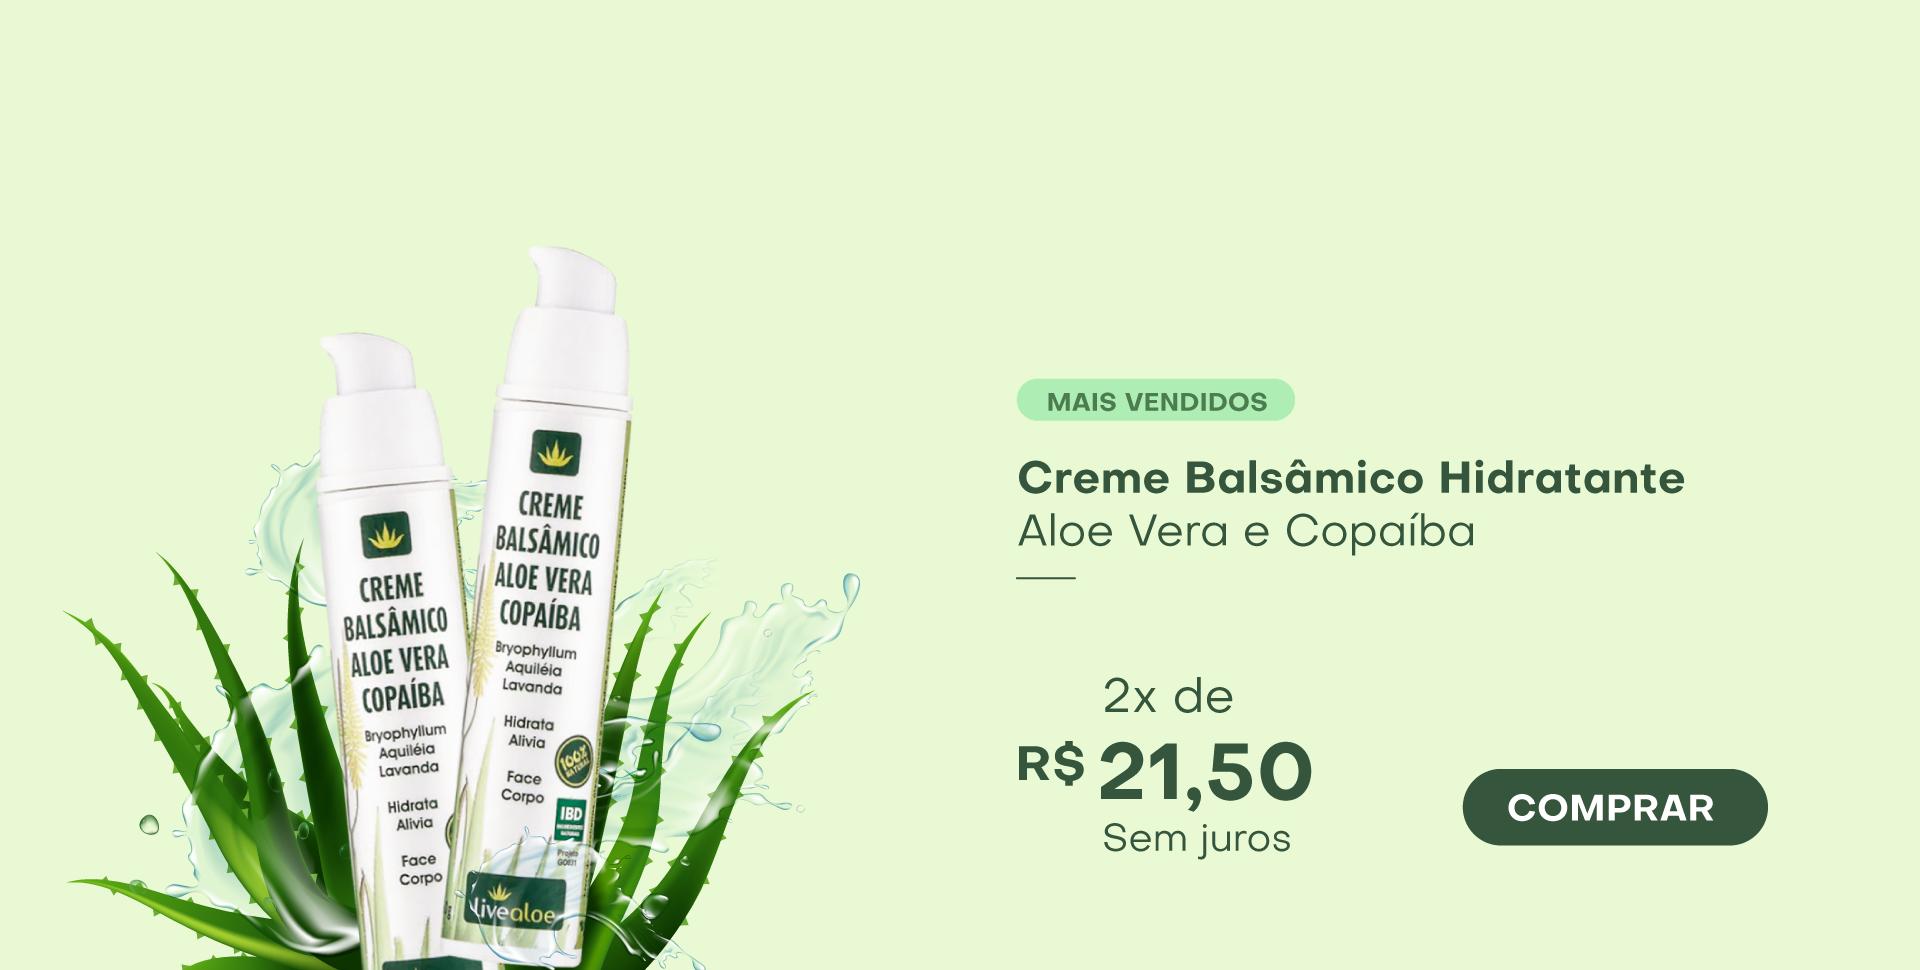 Creme Balsâmico Hidratante Aloe e Copaíba